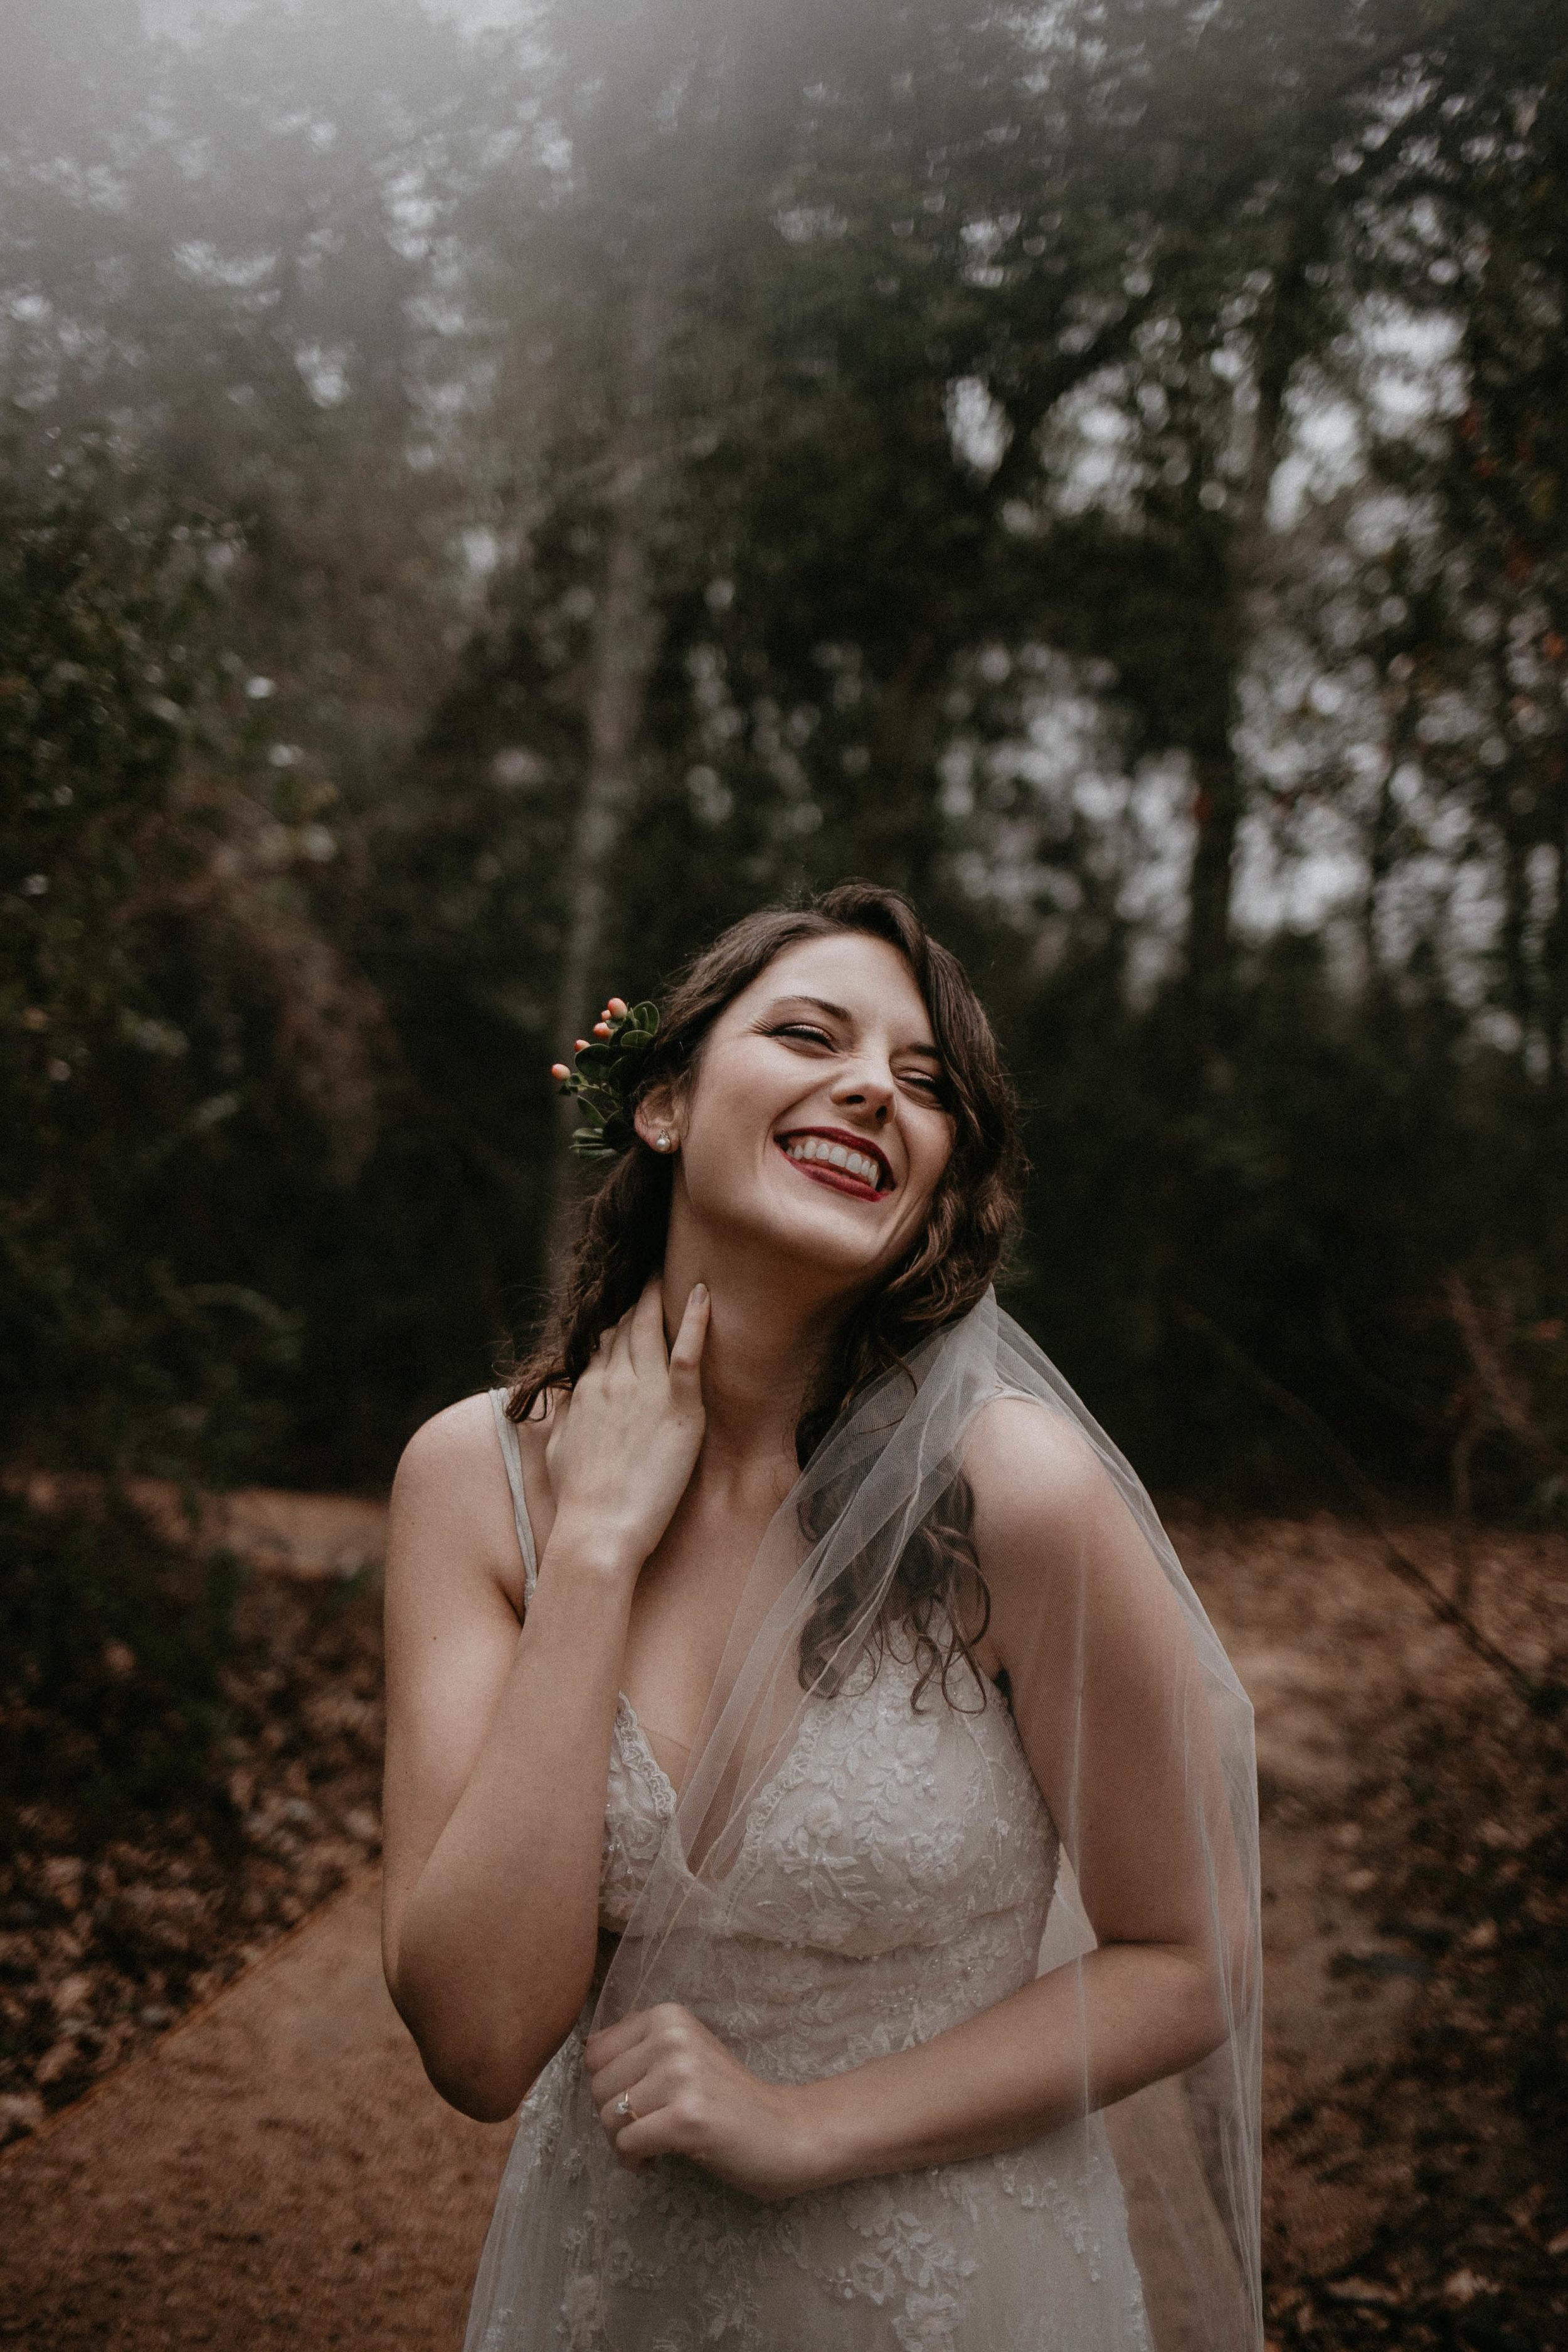 Best Wedding Photographer in Lubbock Texas   Kailee Ann Photography   Best Portrait Photographer in Lubbock Texas